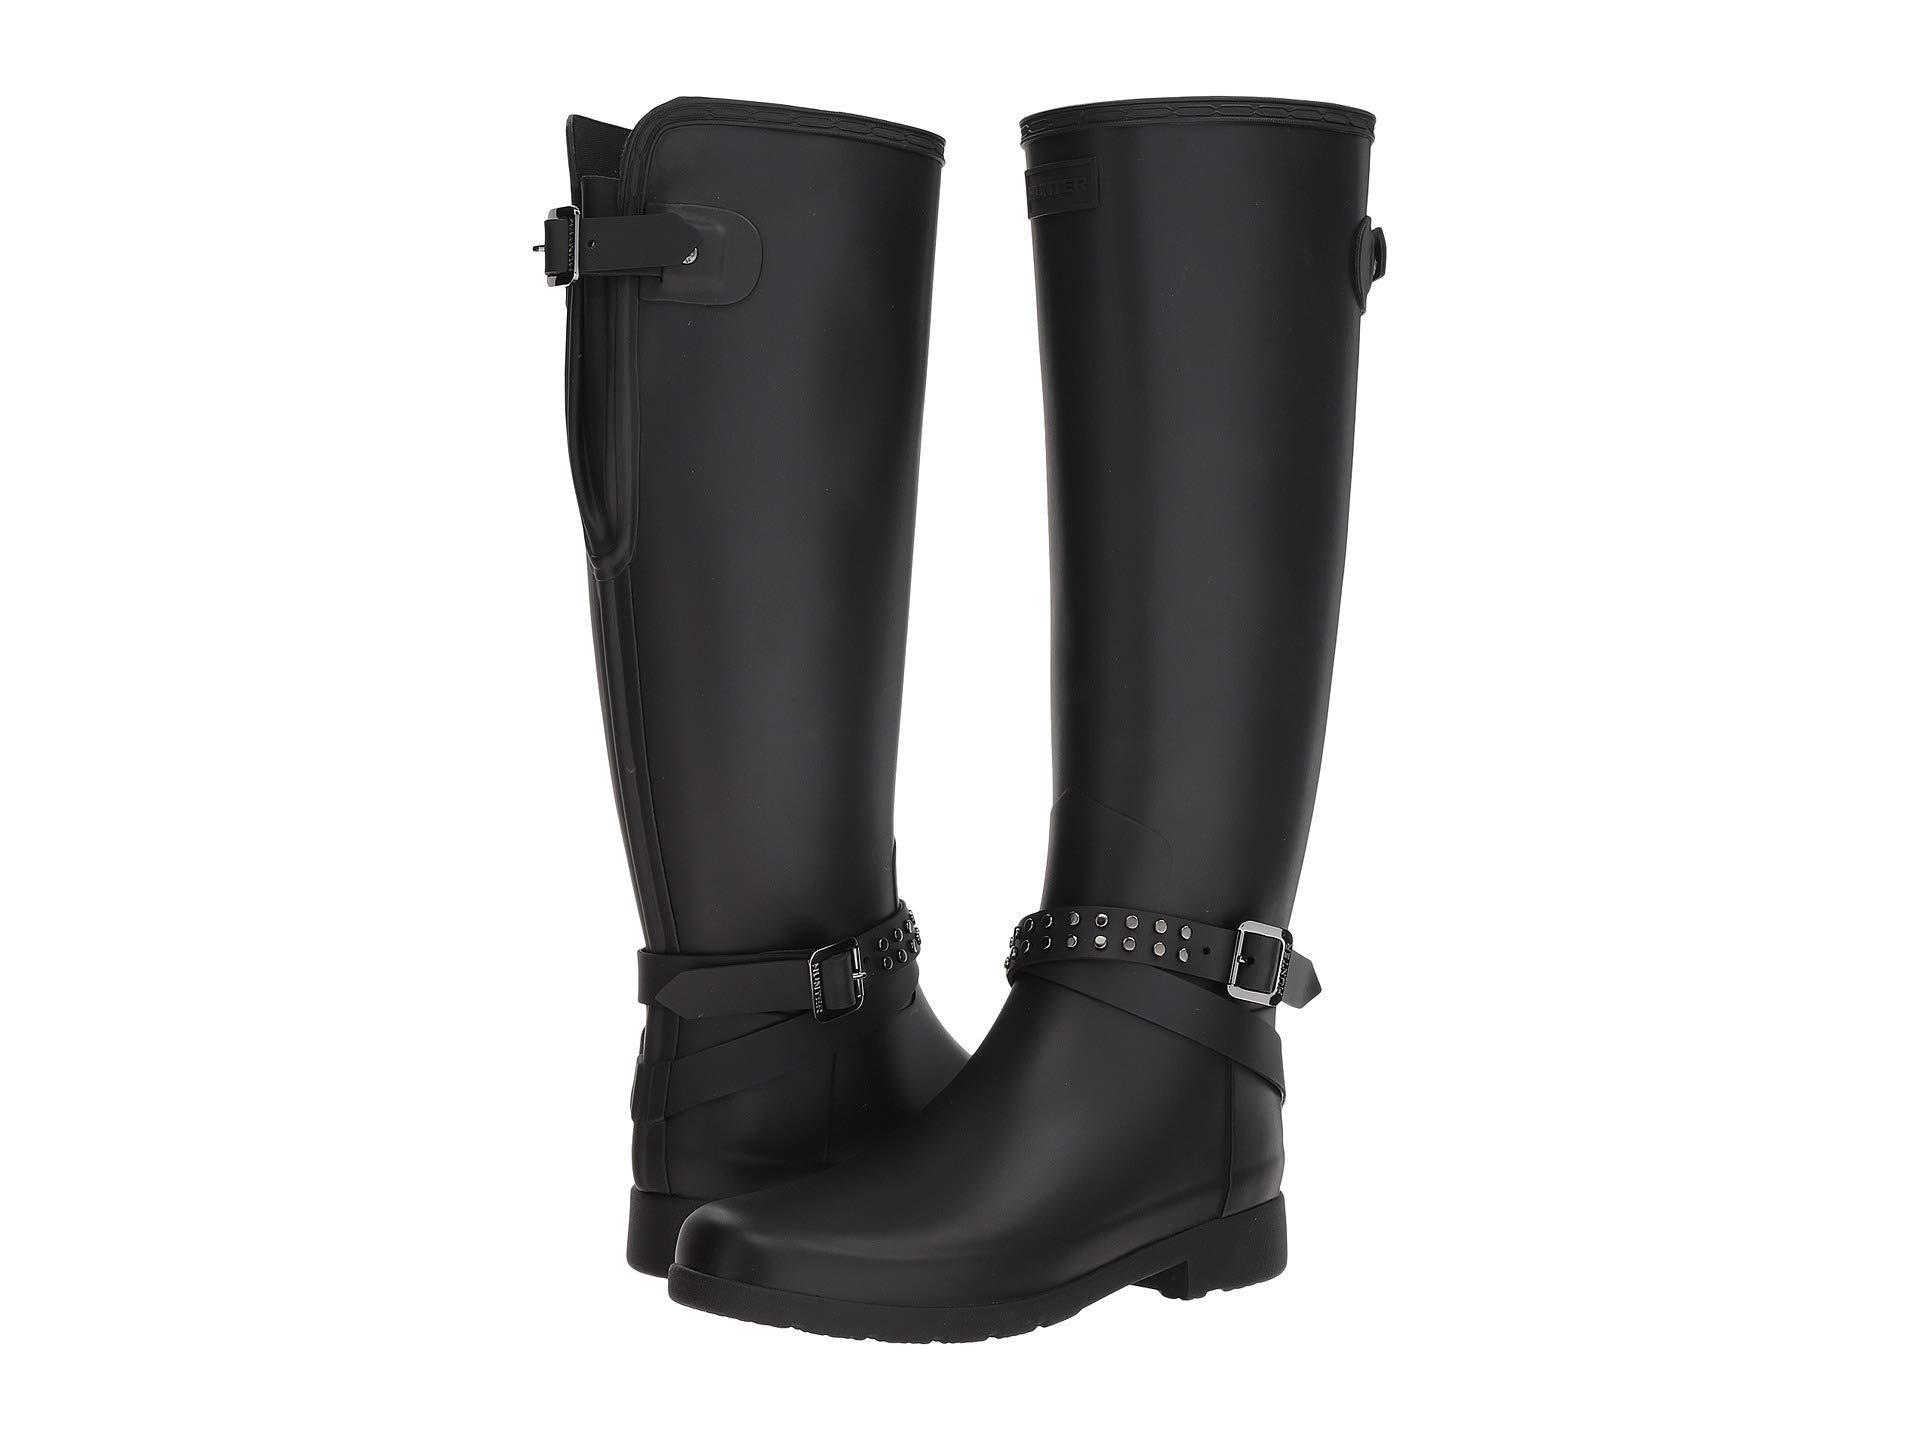 Lyst - HUNTER Refined Back Adjustable Calf Stud Tall Rain Boots ... 49fb53bab1